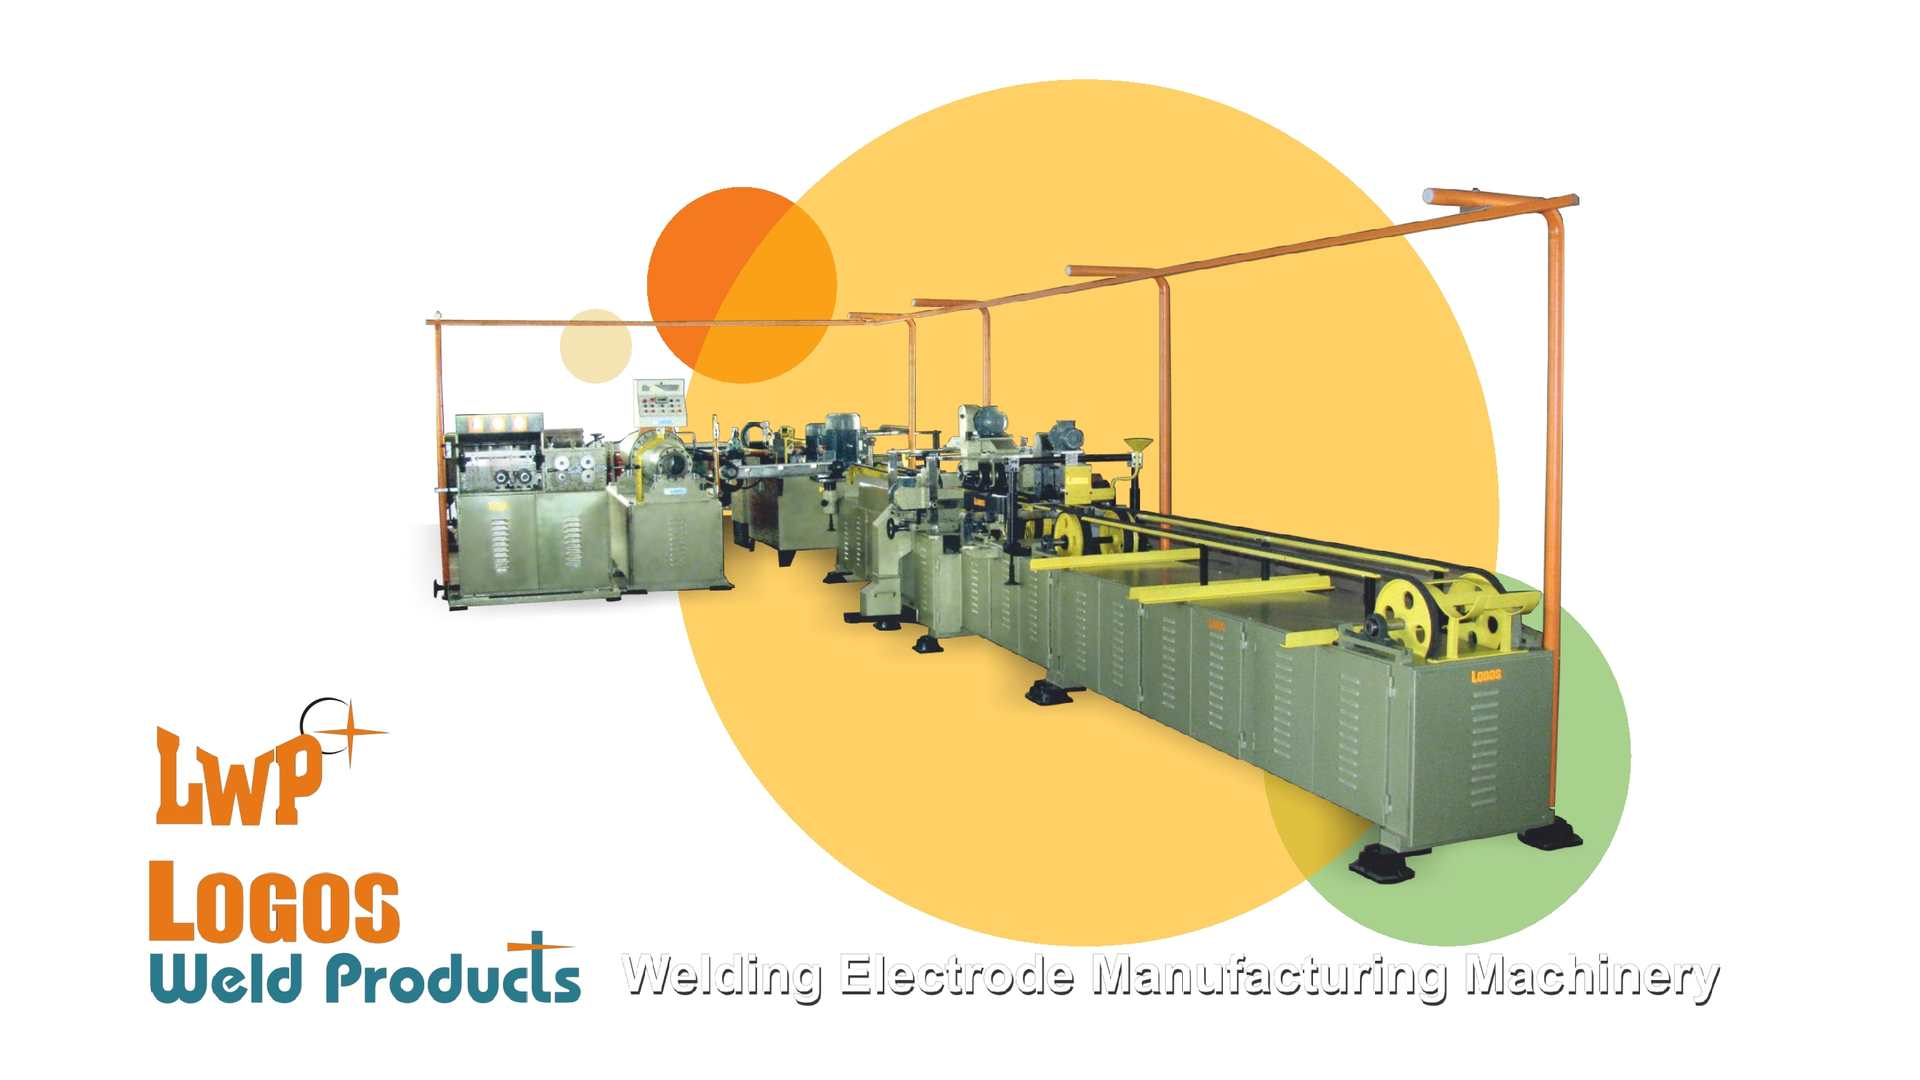 Calamo Welding Electrode Plant Diagram